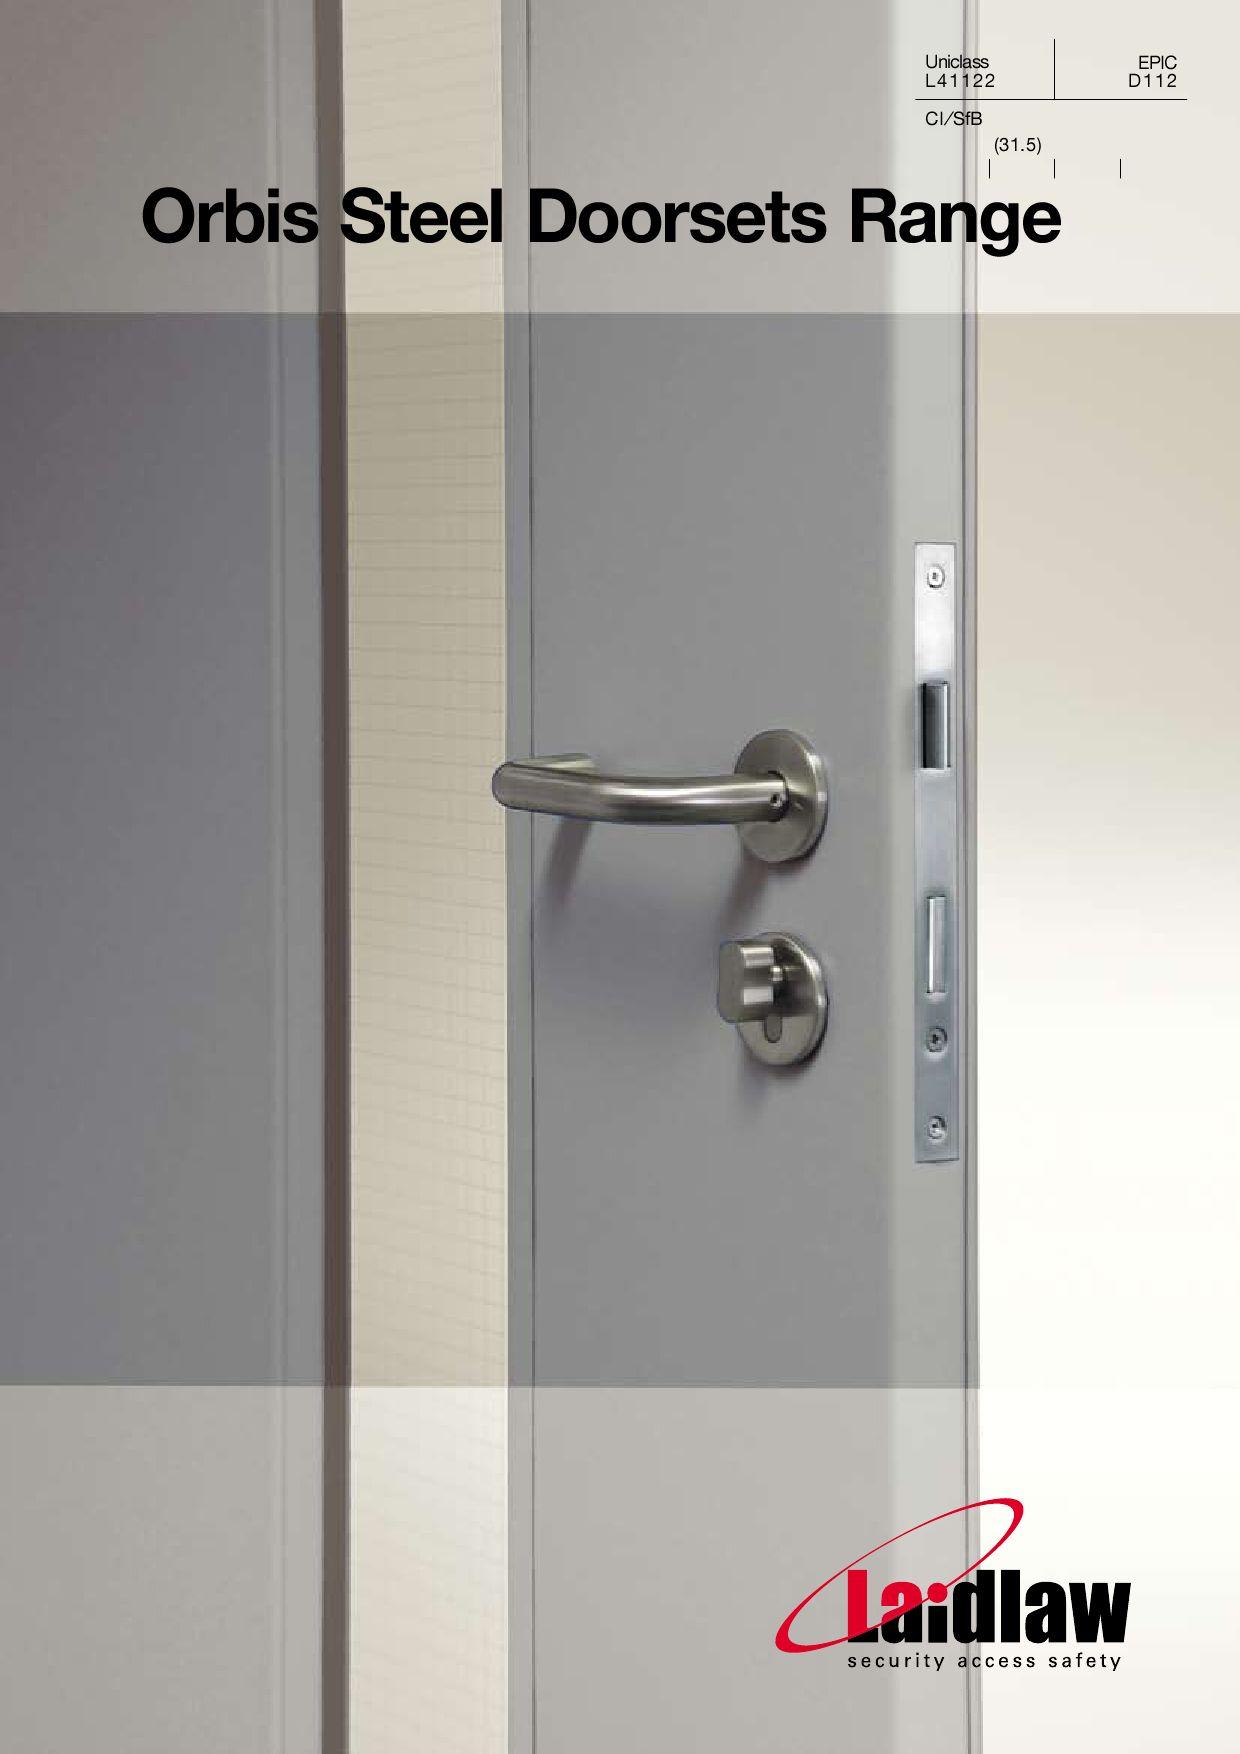 & Orbis Steel Doorsets Range by Laidlaw Solutions Ltd - issuu pezcame.com